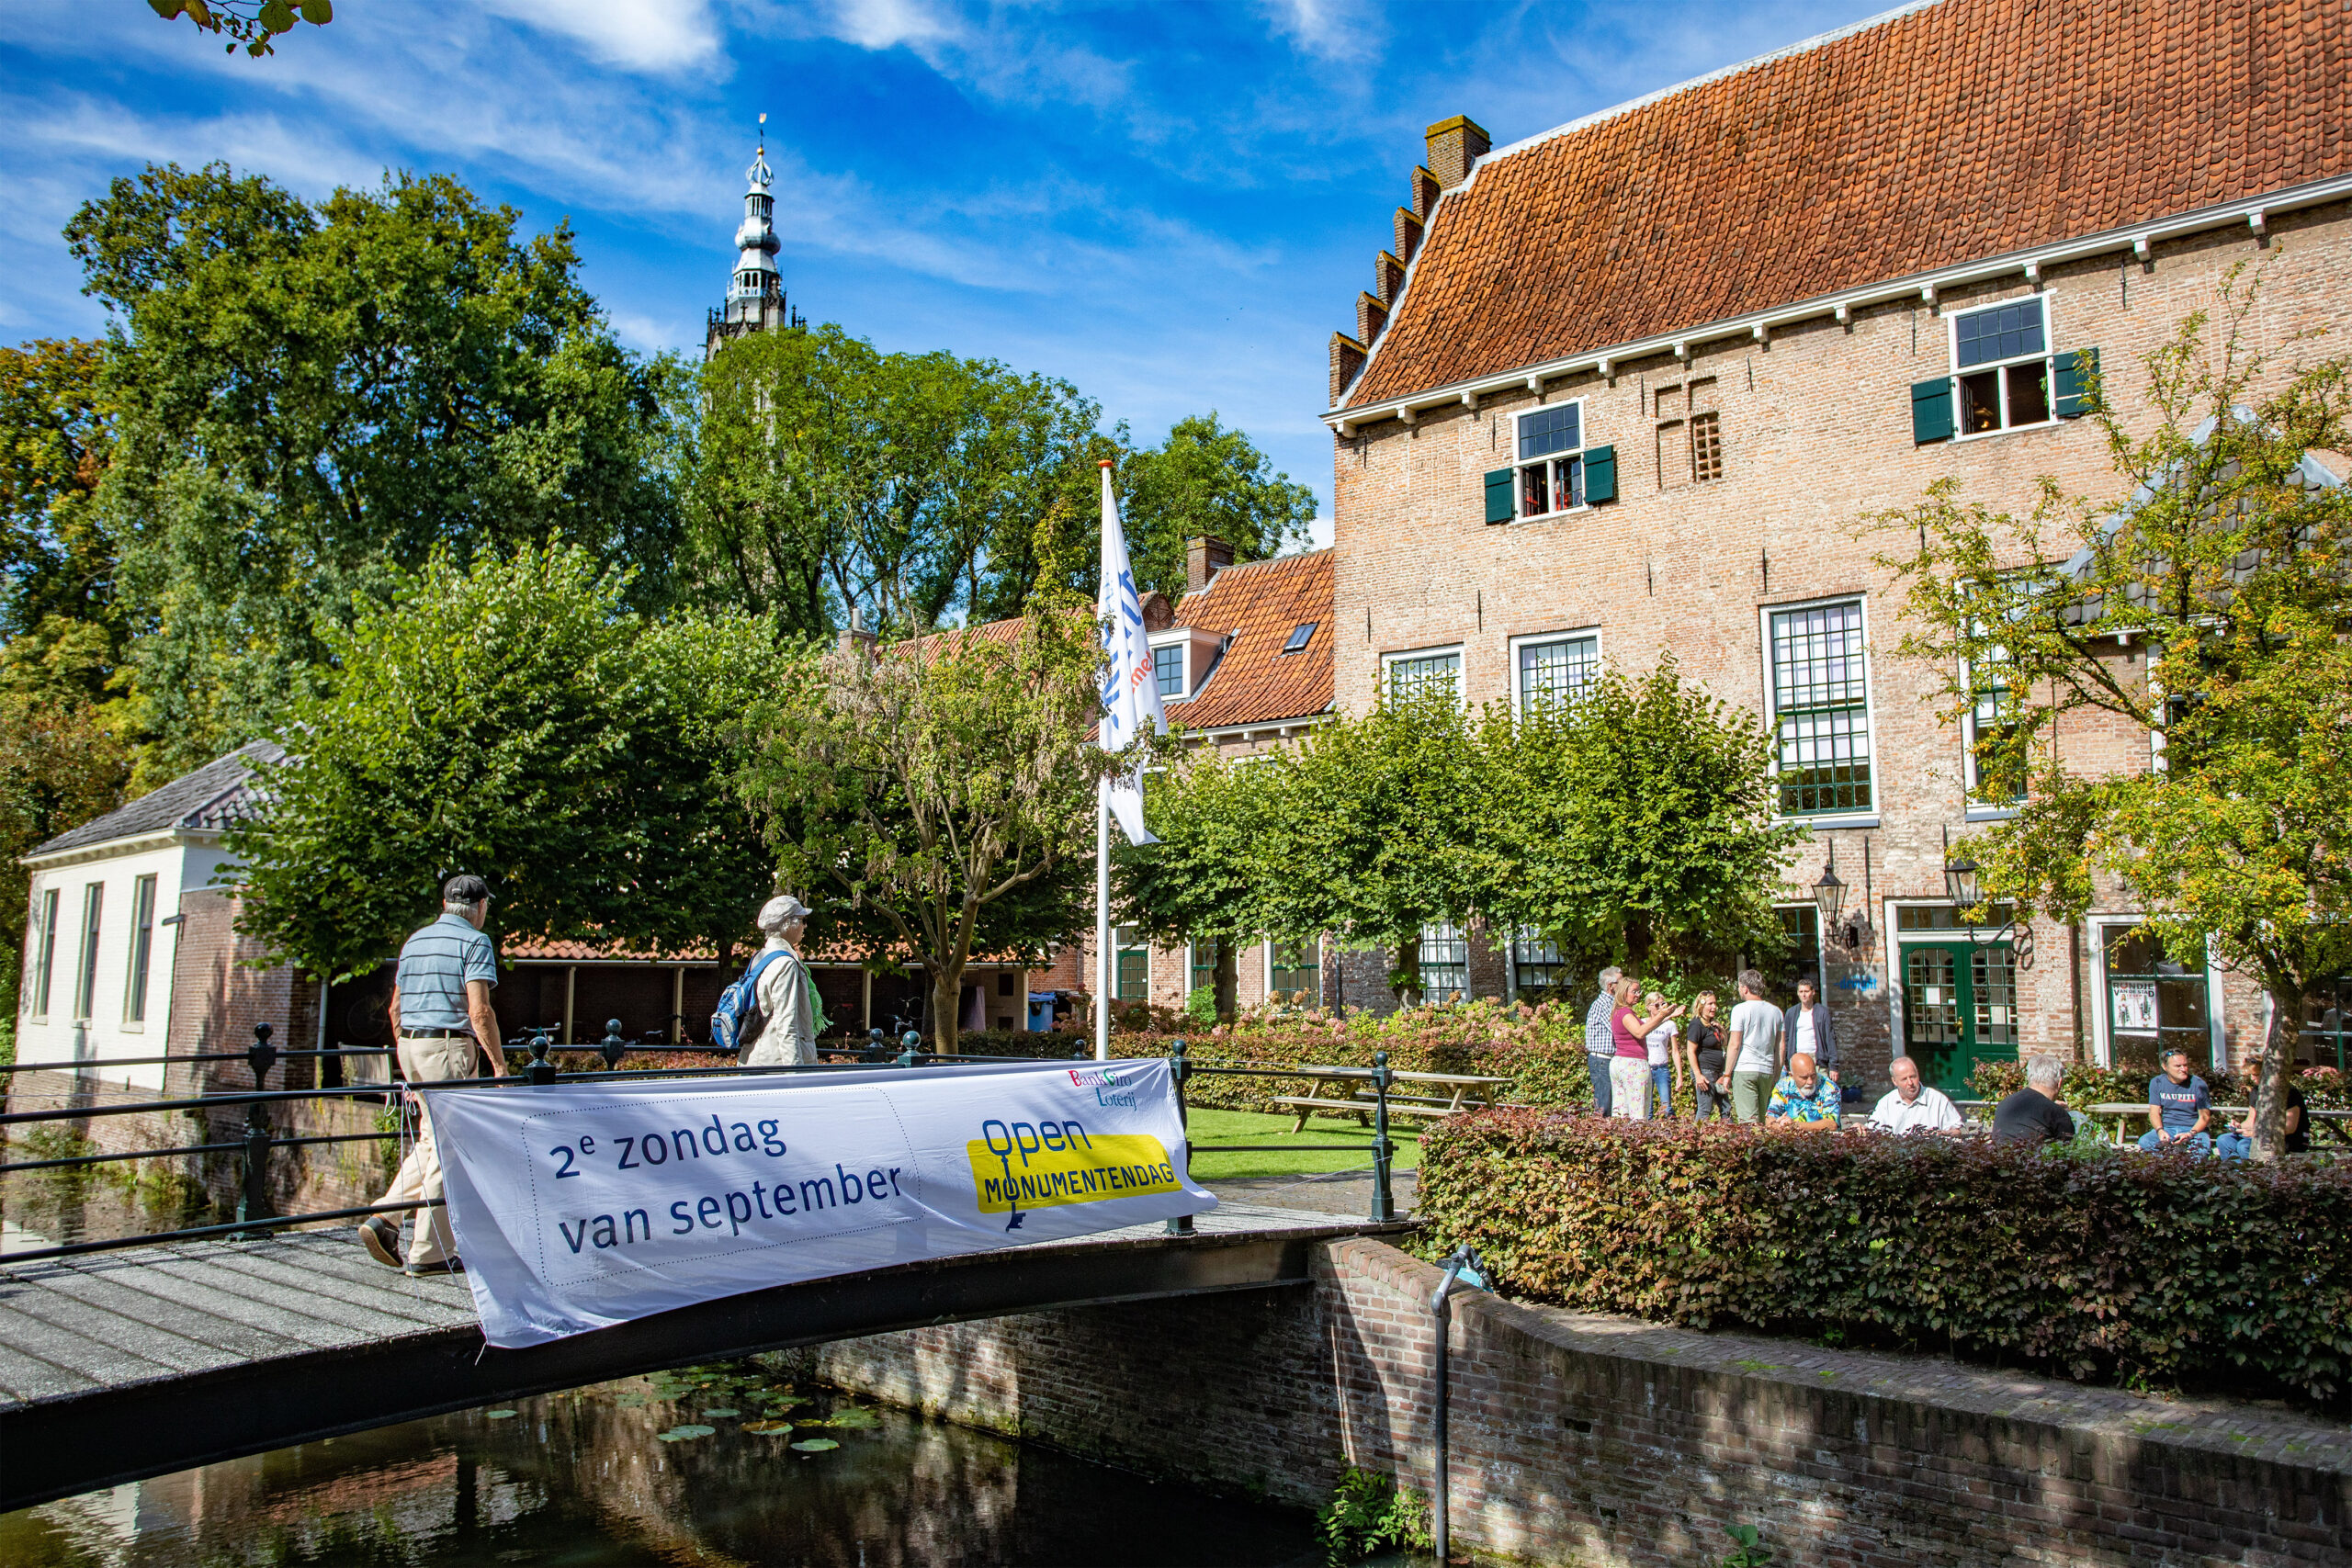 Bob Awick Leiden Open Monumentendag 2019